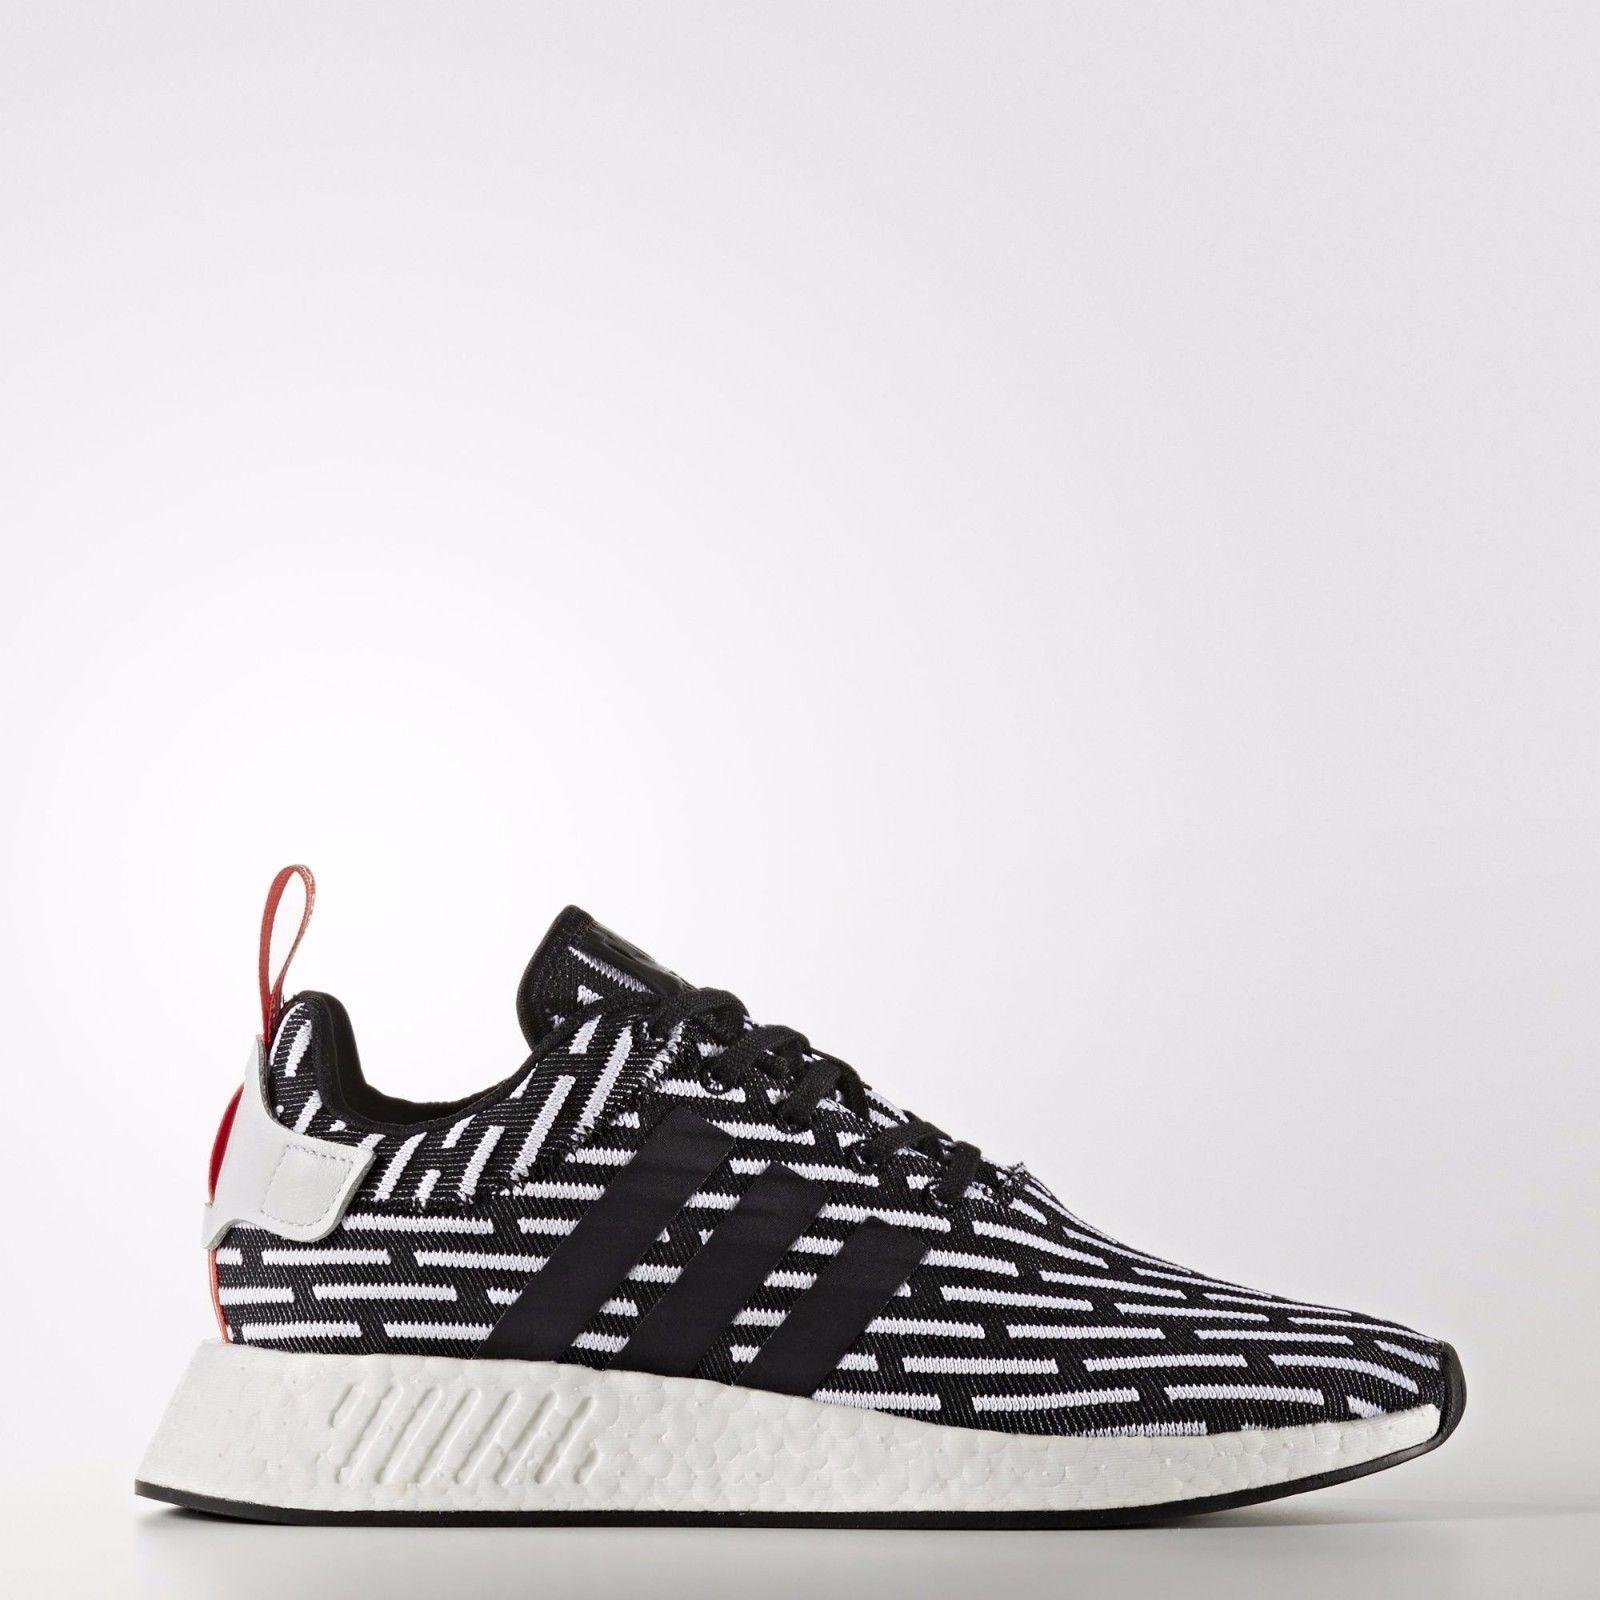 [Adidas] BB2951 NMD R2 PK Prime Knit Running hommes femmes Chaussures noir blanc